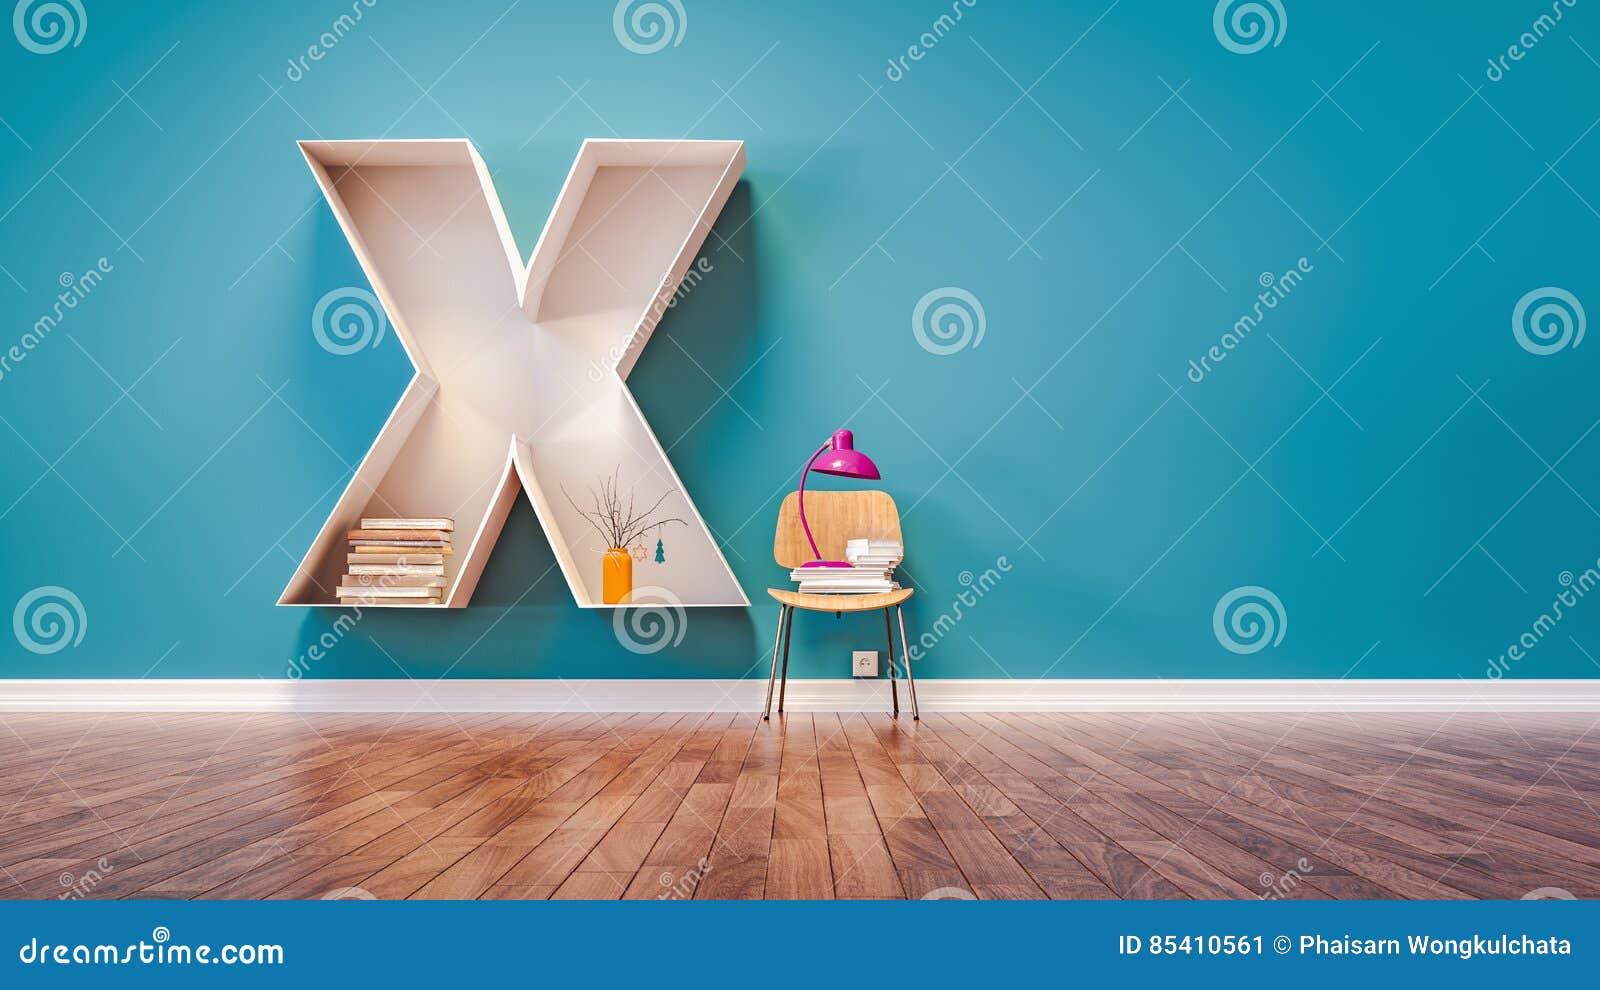 Room For Learning The Letter X Has Designed A Bookshelf